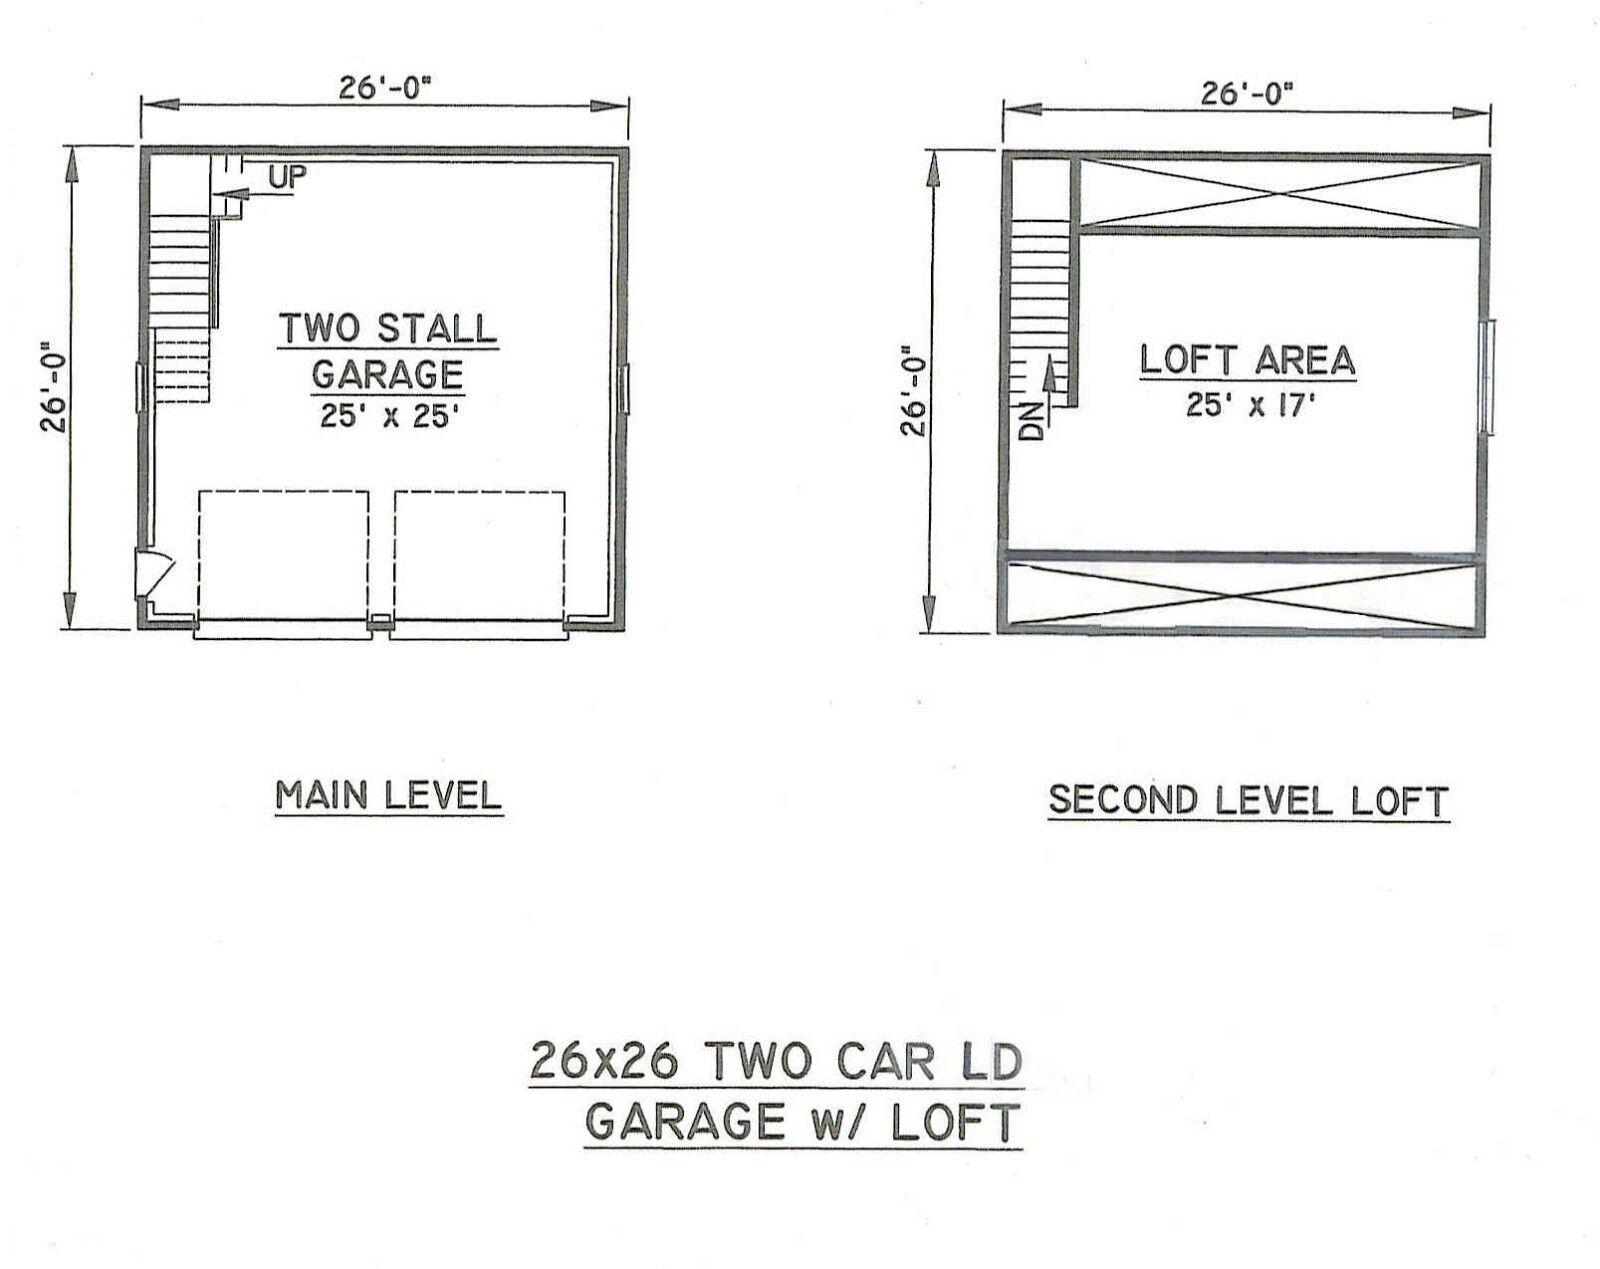 26x26 2-Car 2-Car 2-Car LD Garage Building Blauprint Plans w/WkpLft e20b0d